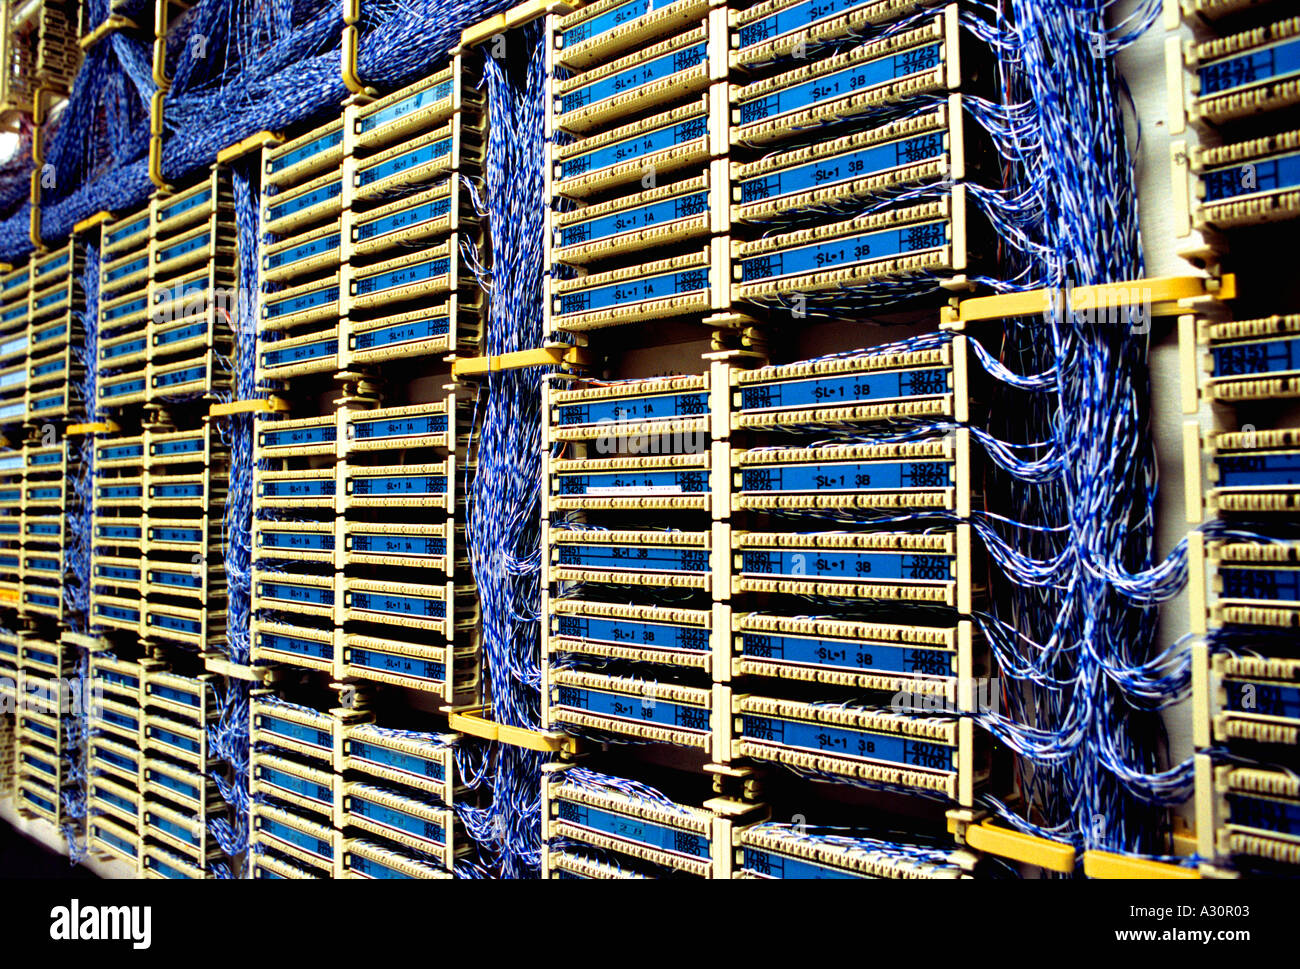 Hauptverteiler Stockfoto, Bild: 3471106 - Alamy